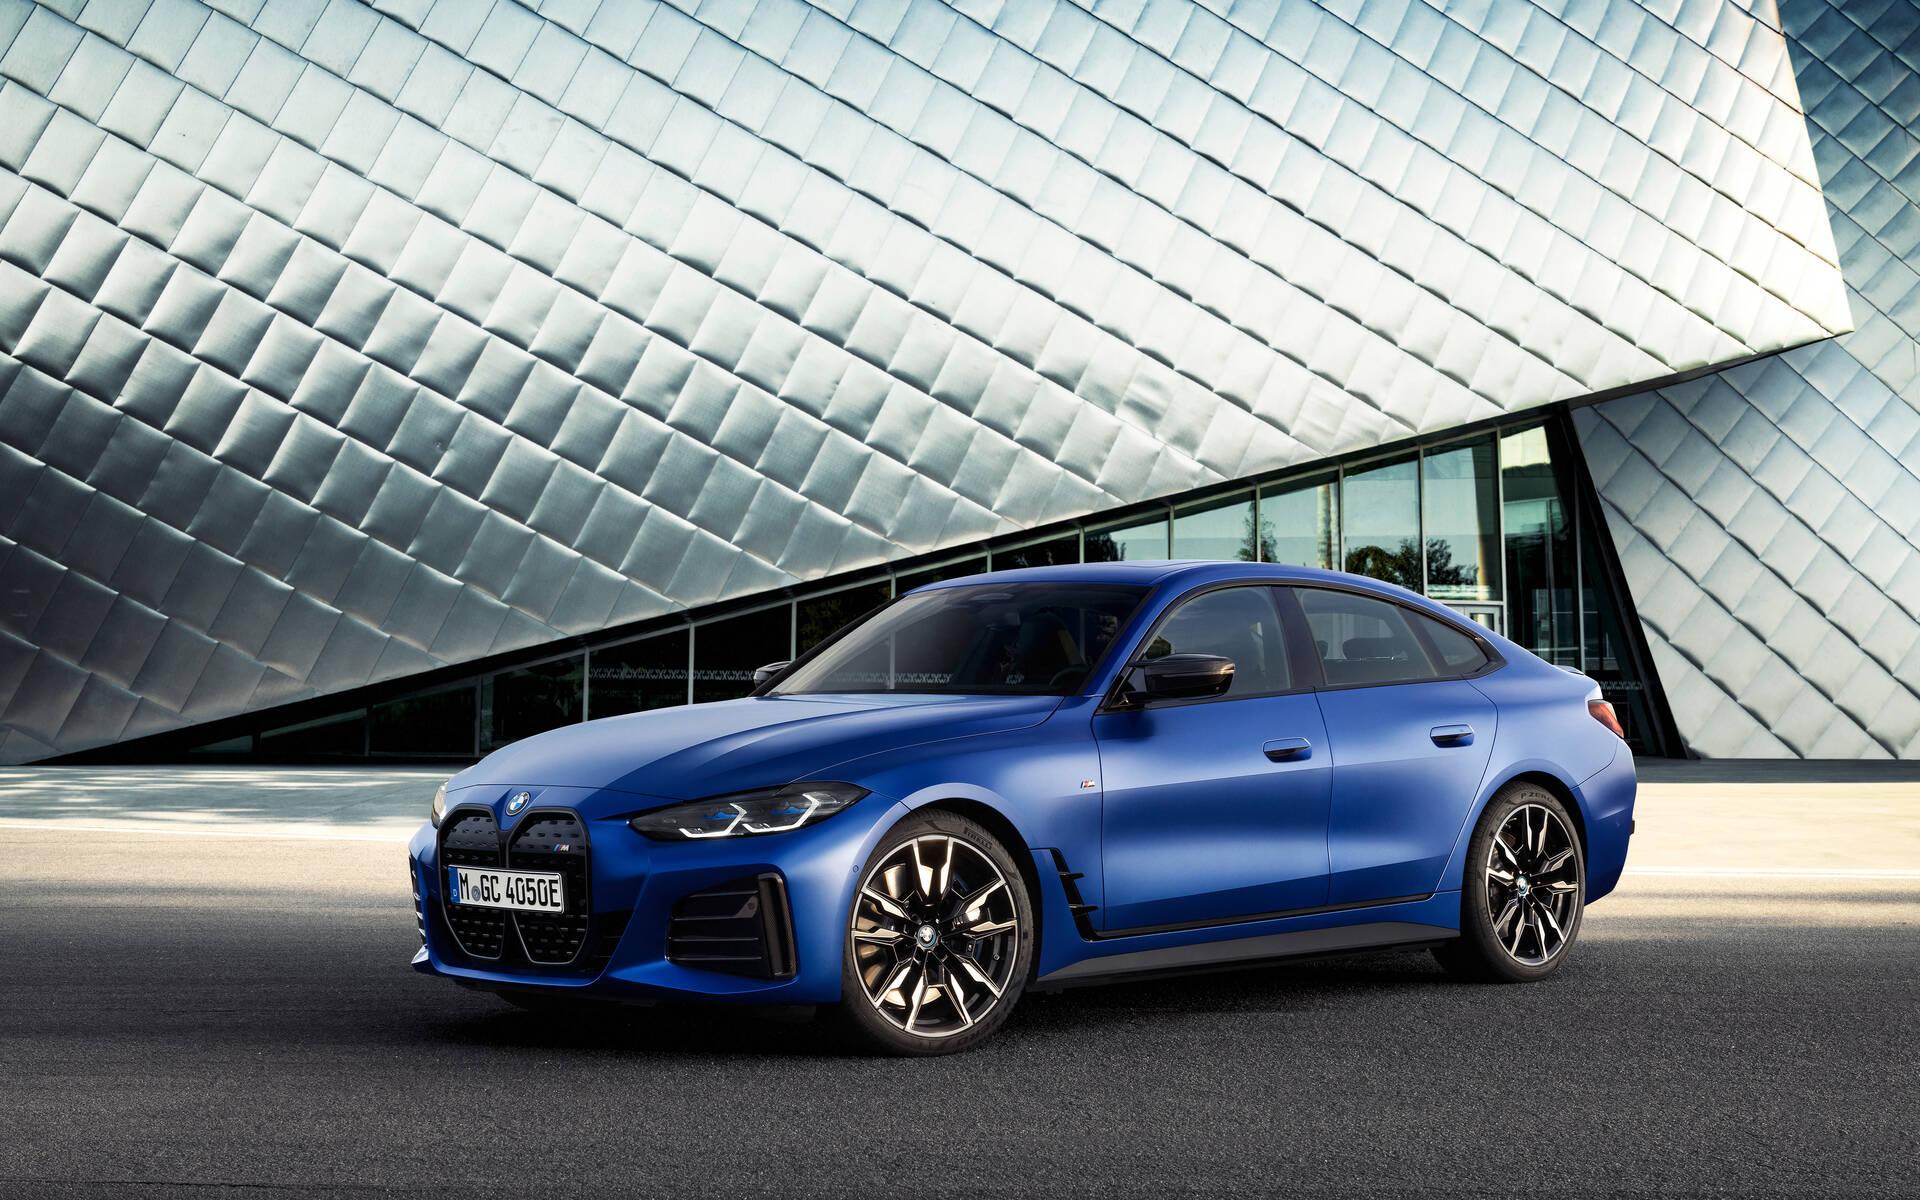 Le look moderne de la BMW i4 eDrive 2022. Source: www.guideauto.ca